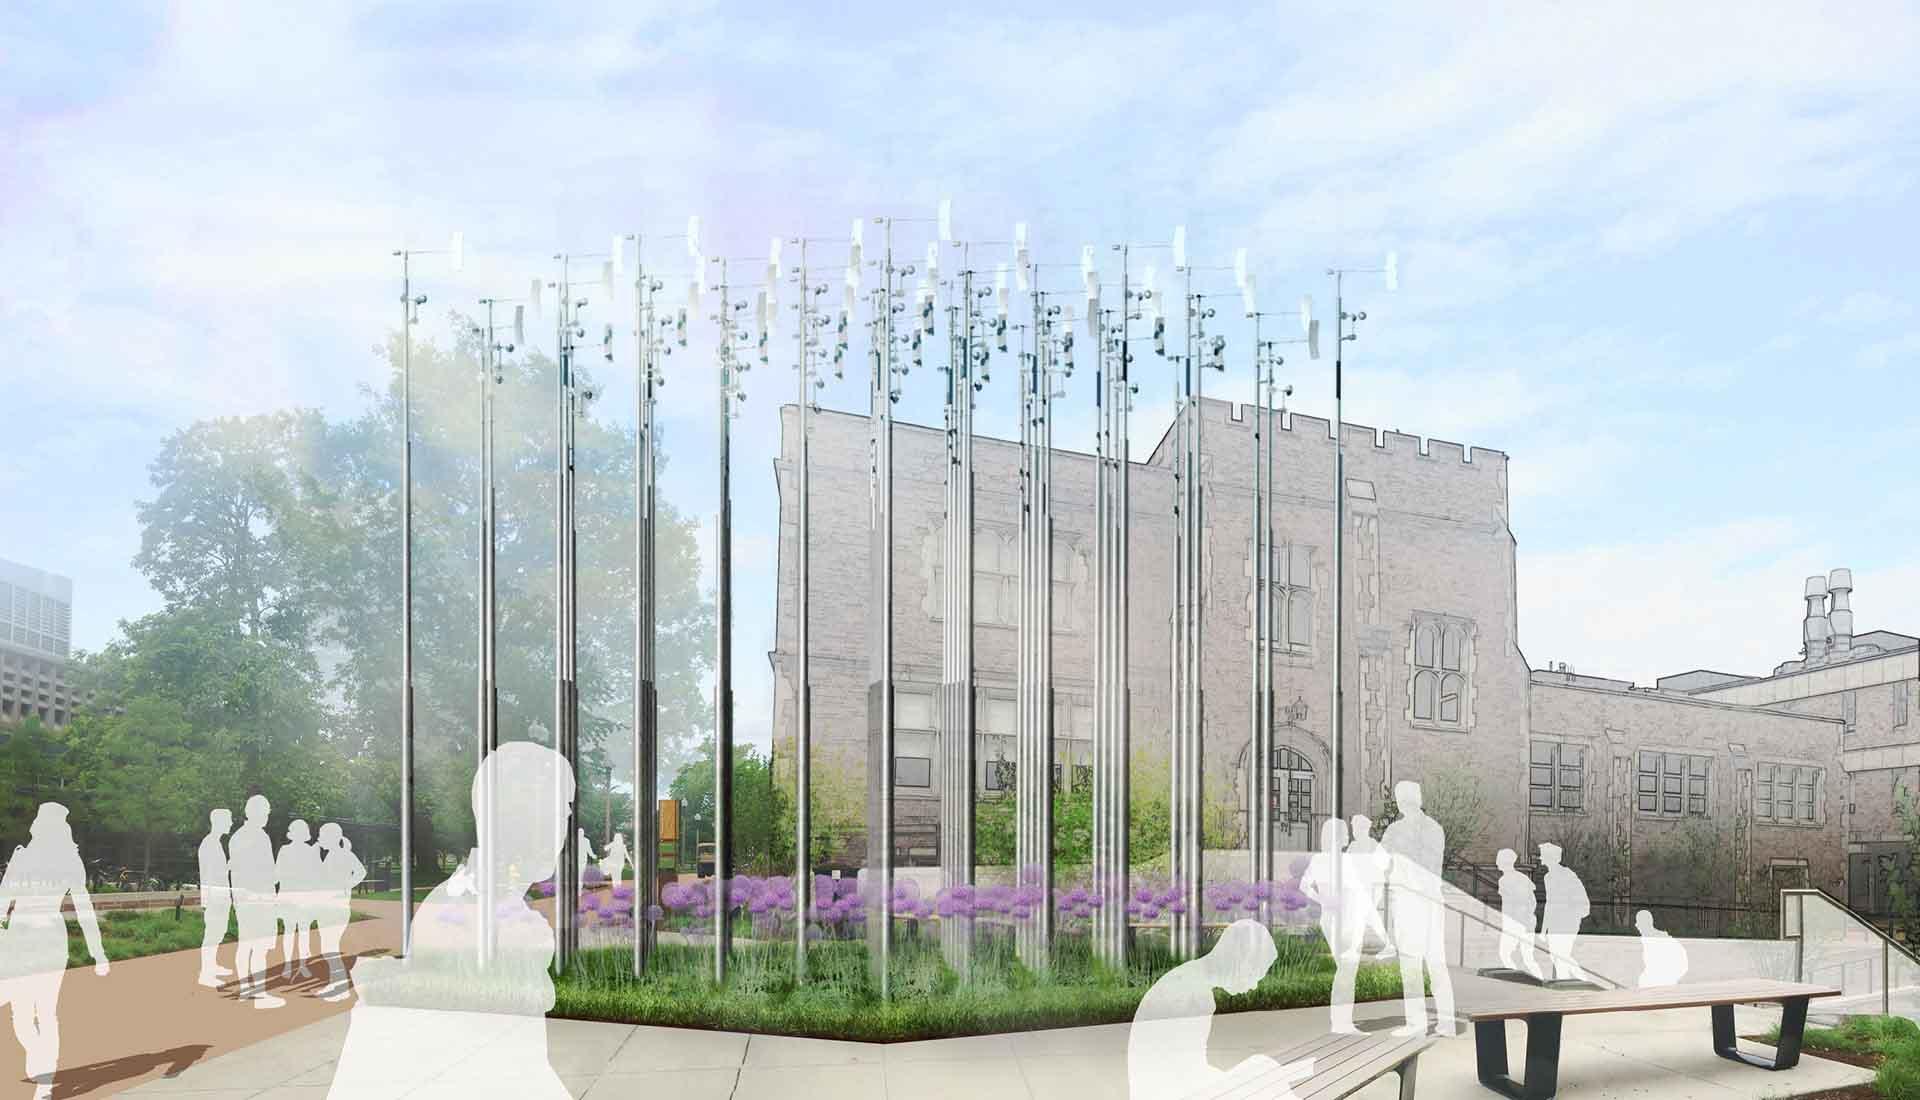 Arbolope Studio | Landscape Architects + Urban Designers | Weather Field No. 2